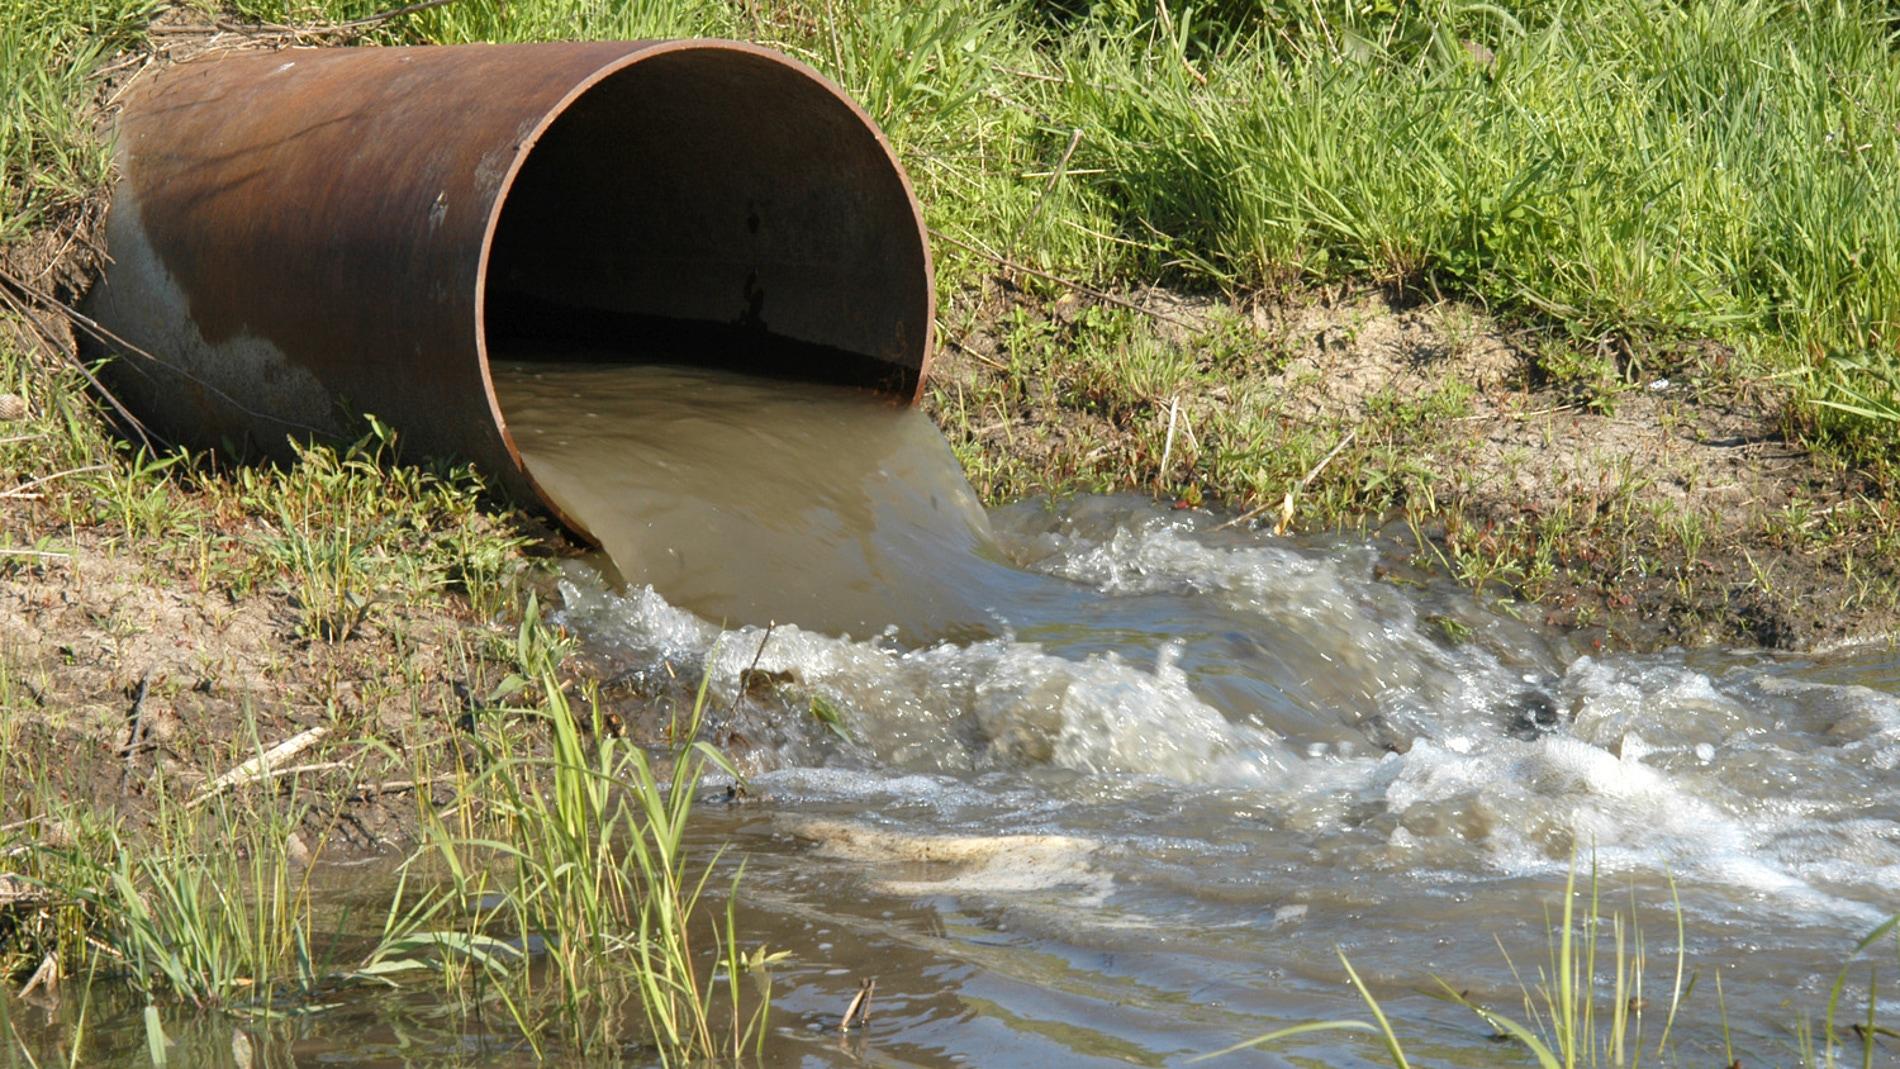 Aguas residuales saliendo de un tubo